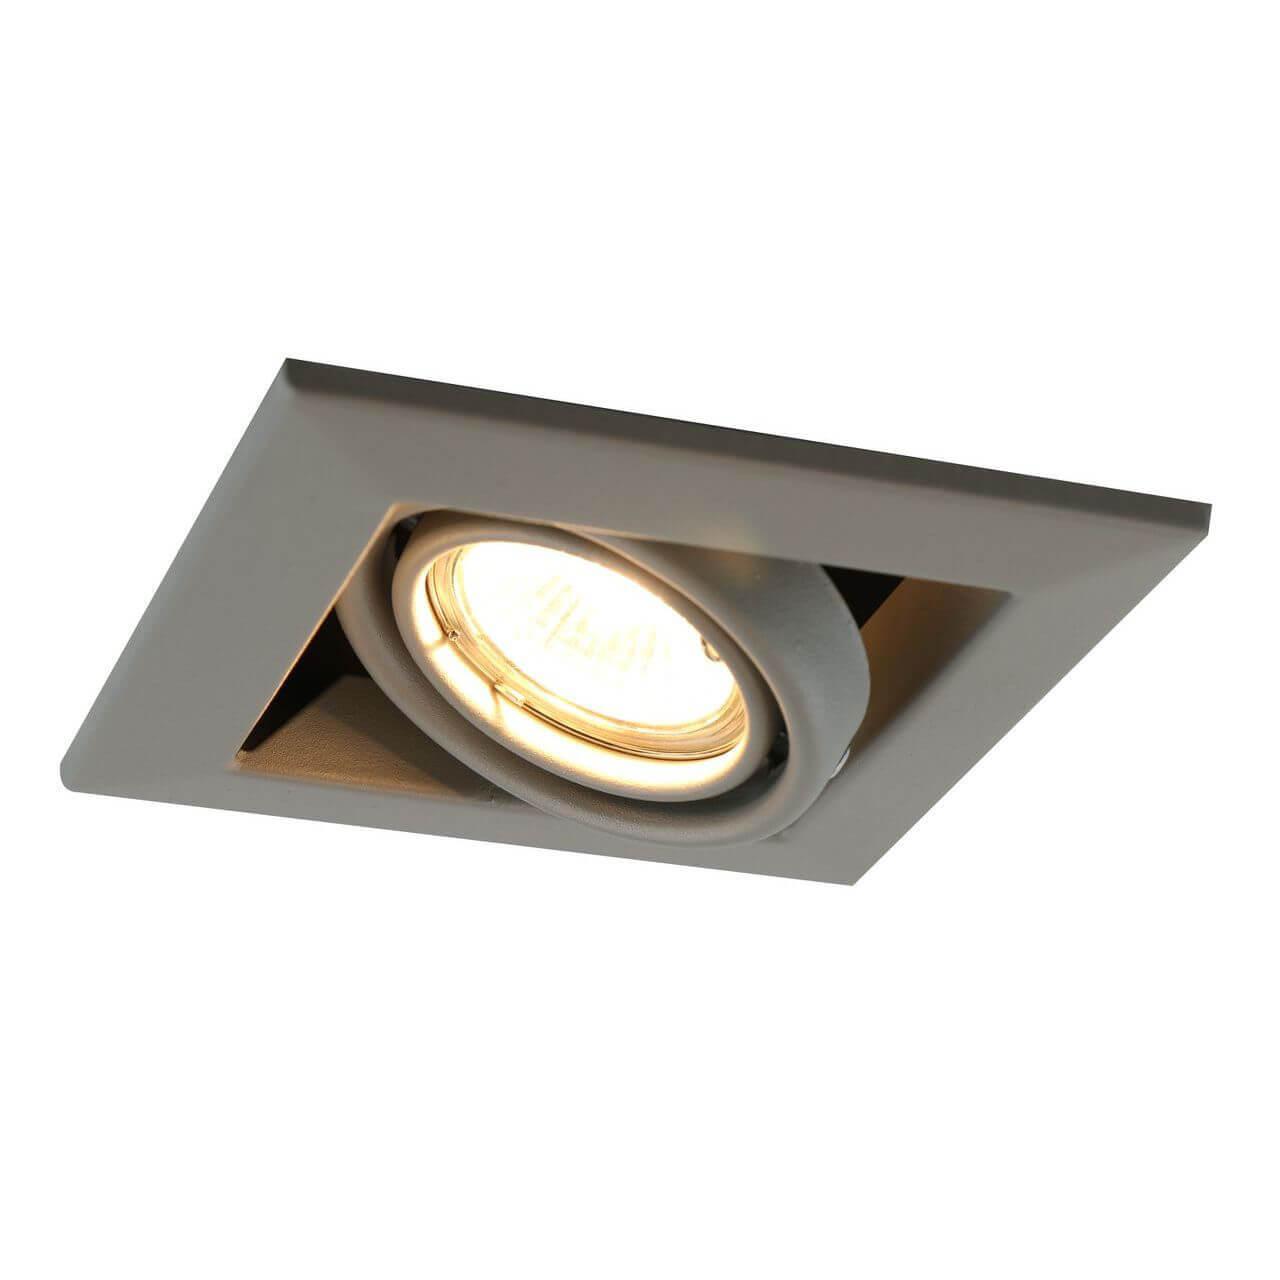 Встраиваемый светильник Arte Lamp Cardani Piccolo A5941PL-1GY arte lamp встраиваемый светильник arte lamp cardani silver a5941pl 4si